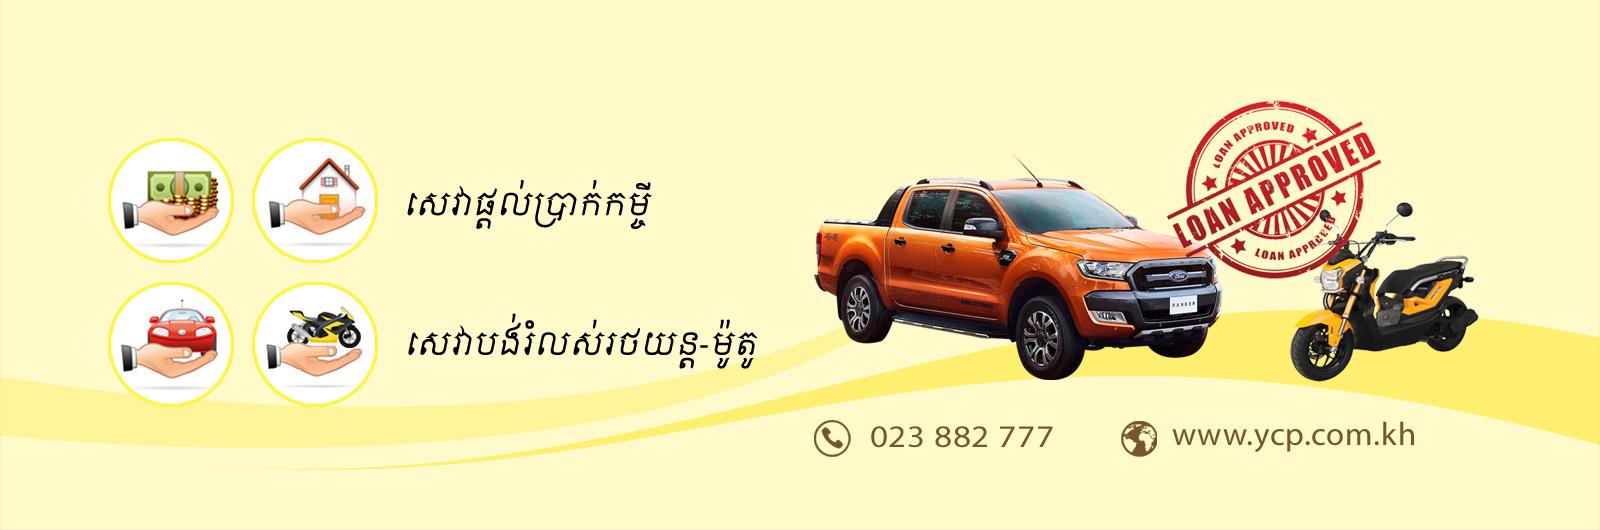 YCP-Car-Motor-Loan1